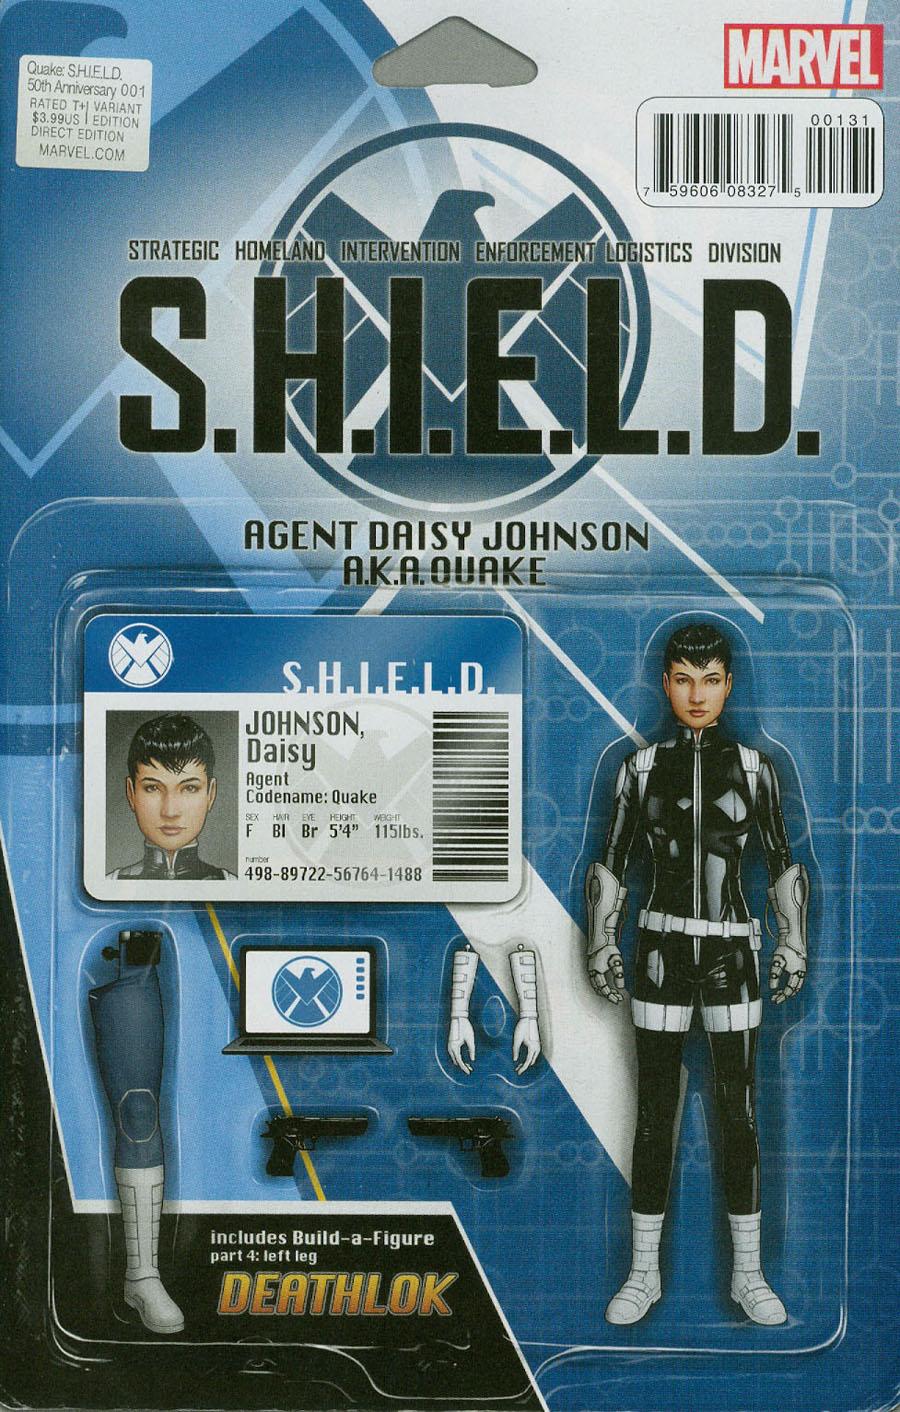 Quake S.H.I.E.L.D. 50th Anniversary #1 Cover C Variant John Tyler Christopher Action Figure Cover